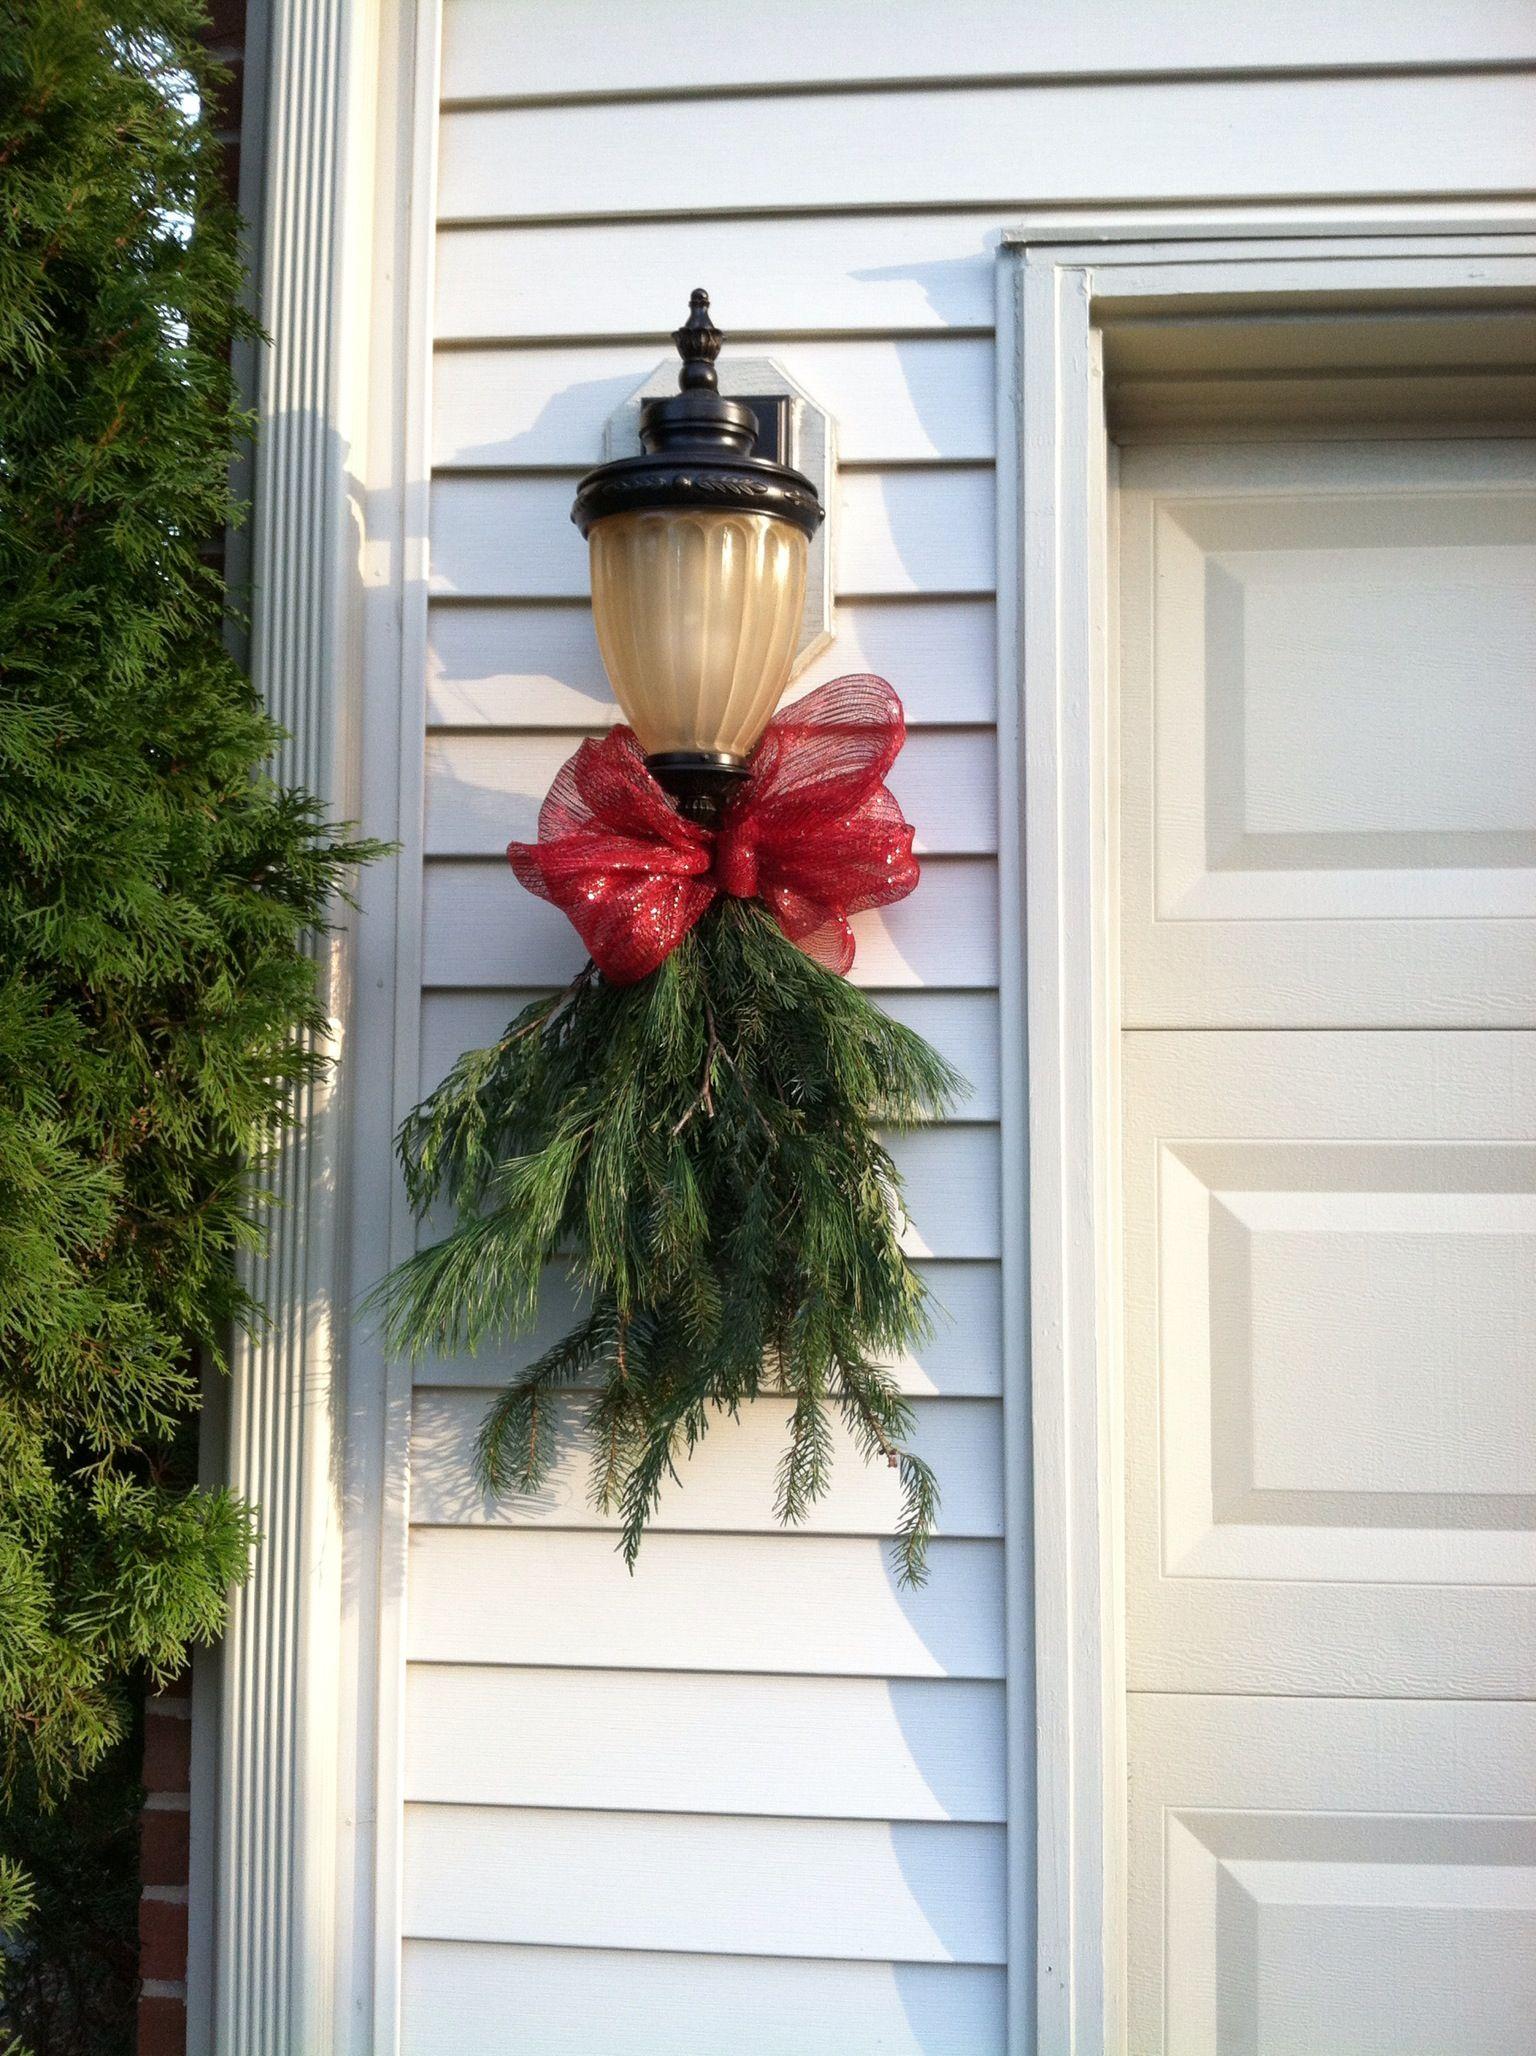 Garage Light Swags Outside Christmas Decorations Decorating With Christmas Lights Christmas Swags